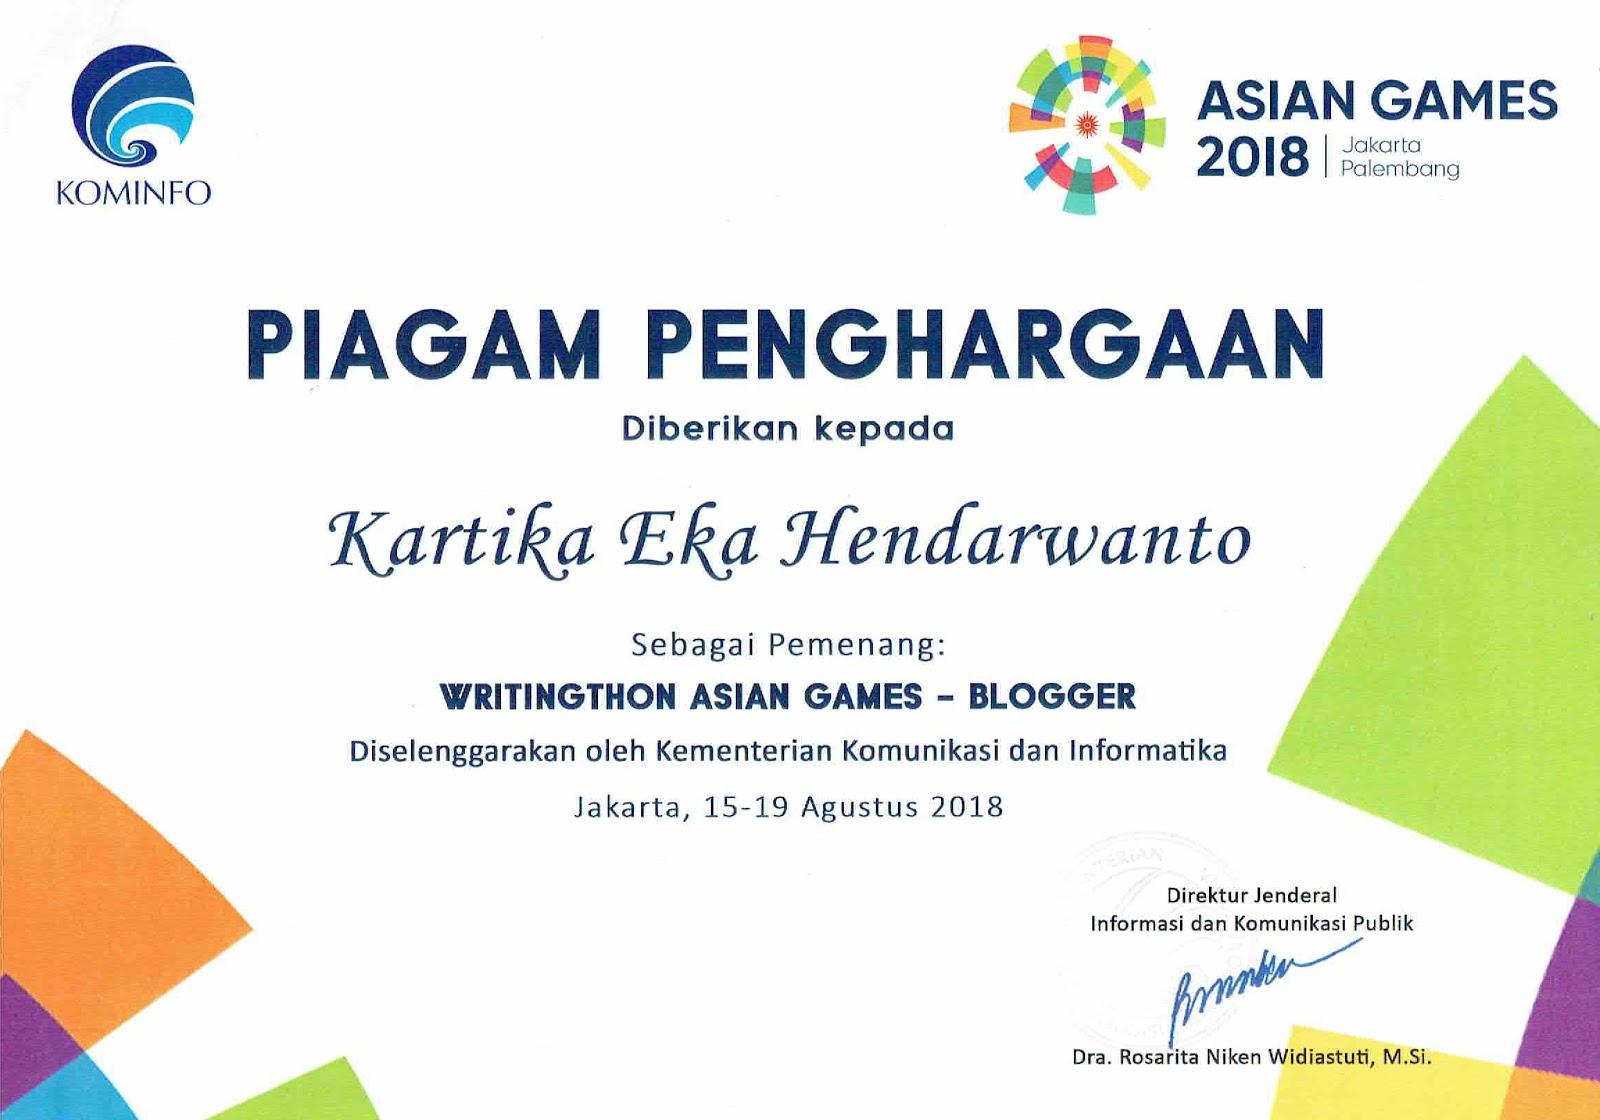 Writingthon Asian Games 2018